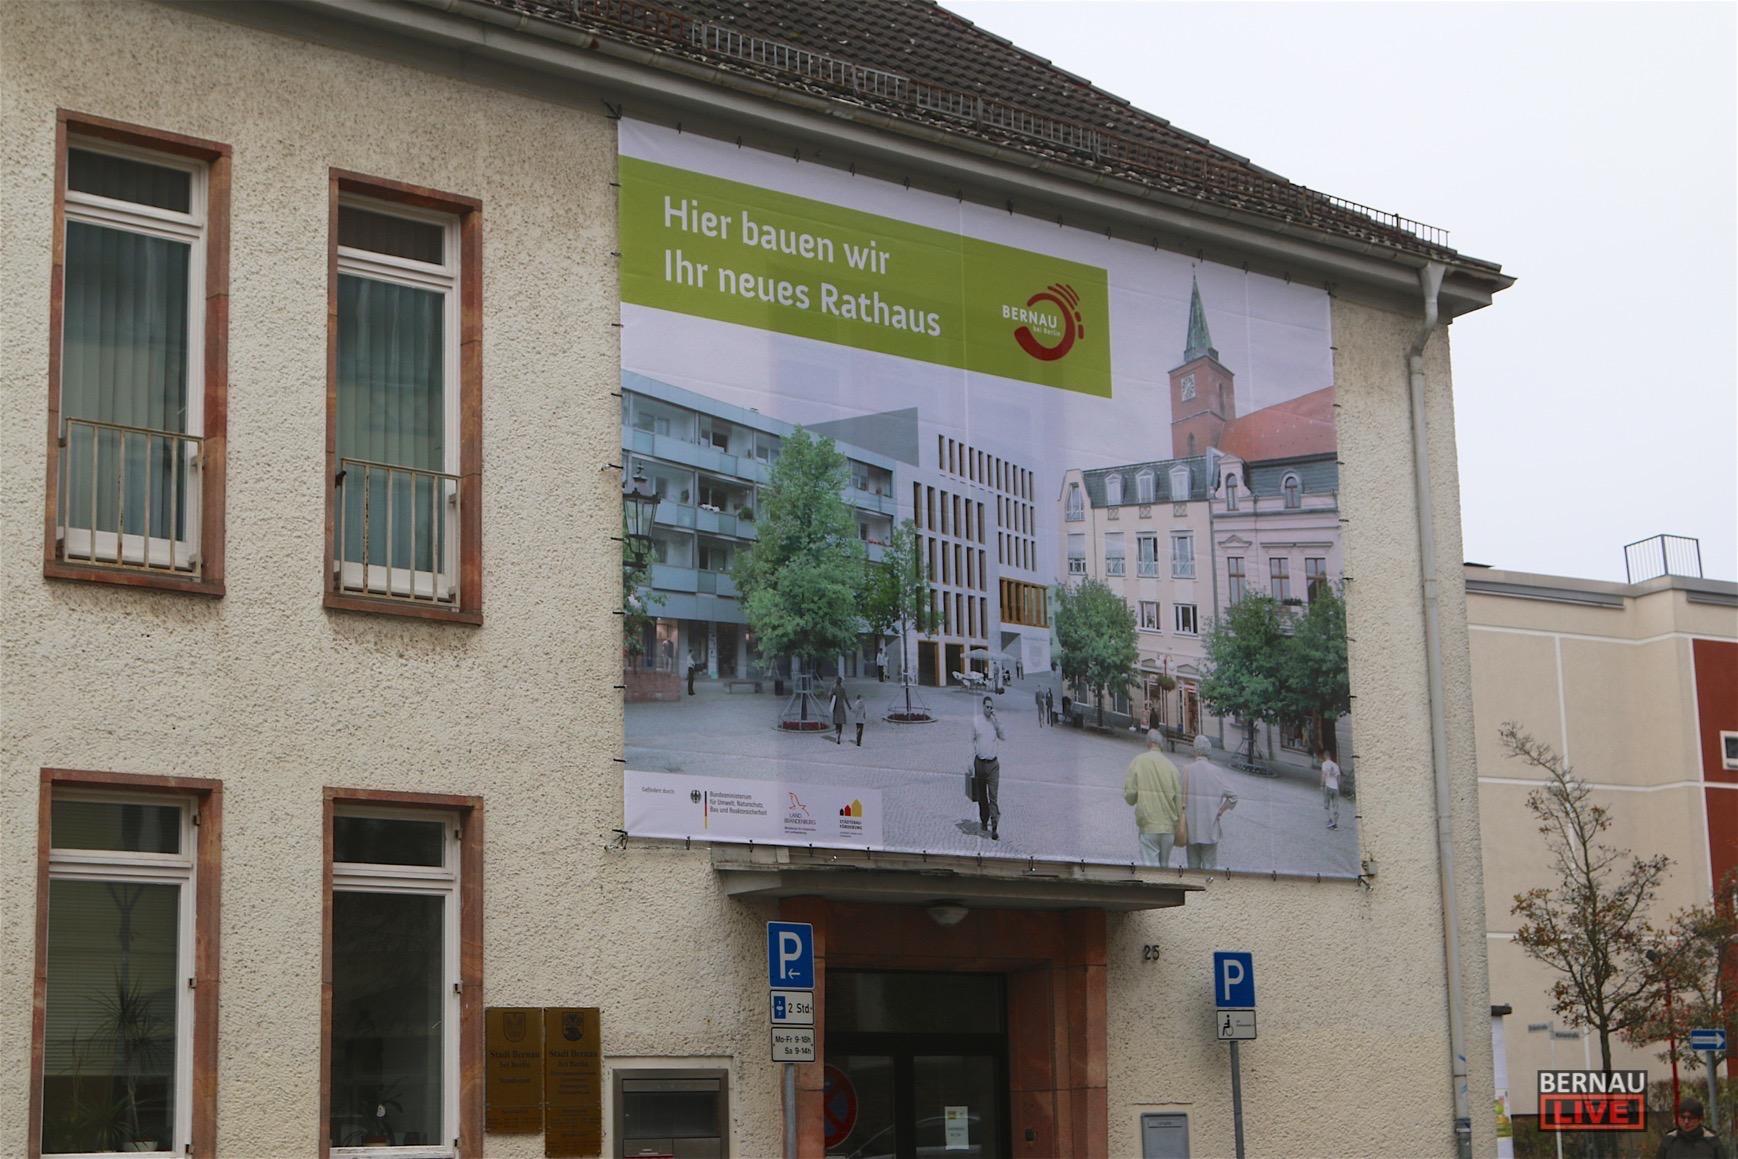 Rathausneubau Bernau - Ämter ziehen vom 03.-11. Juli 2017 um